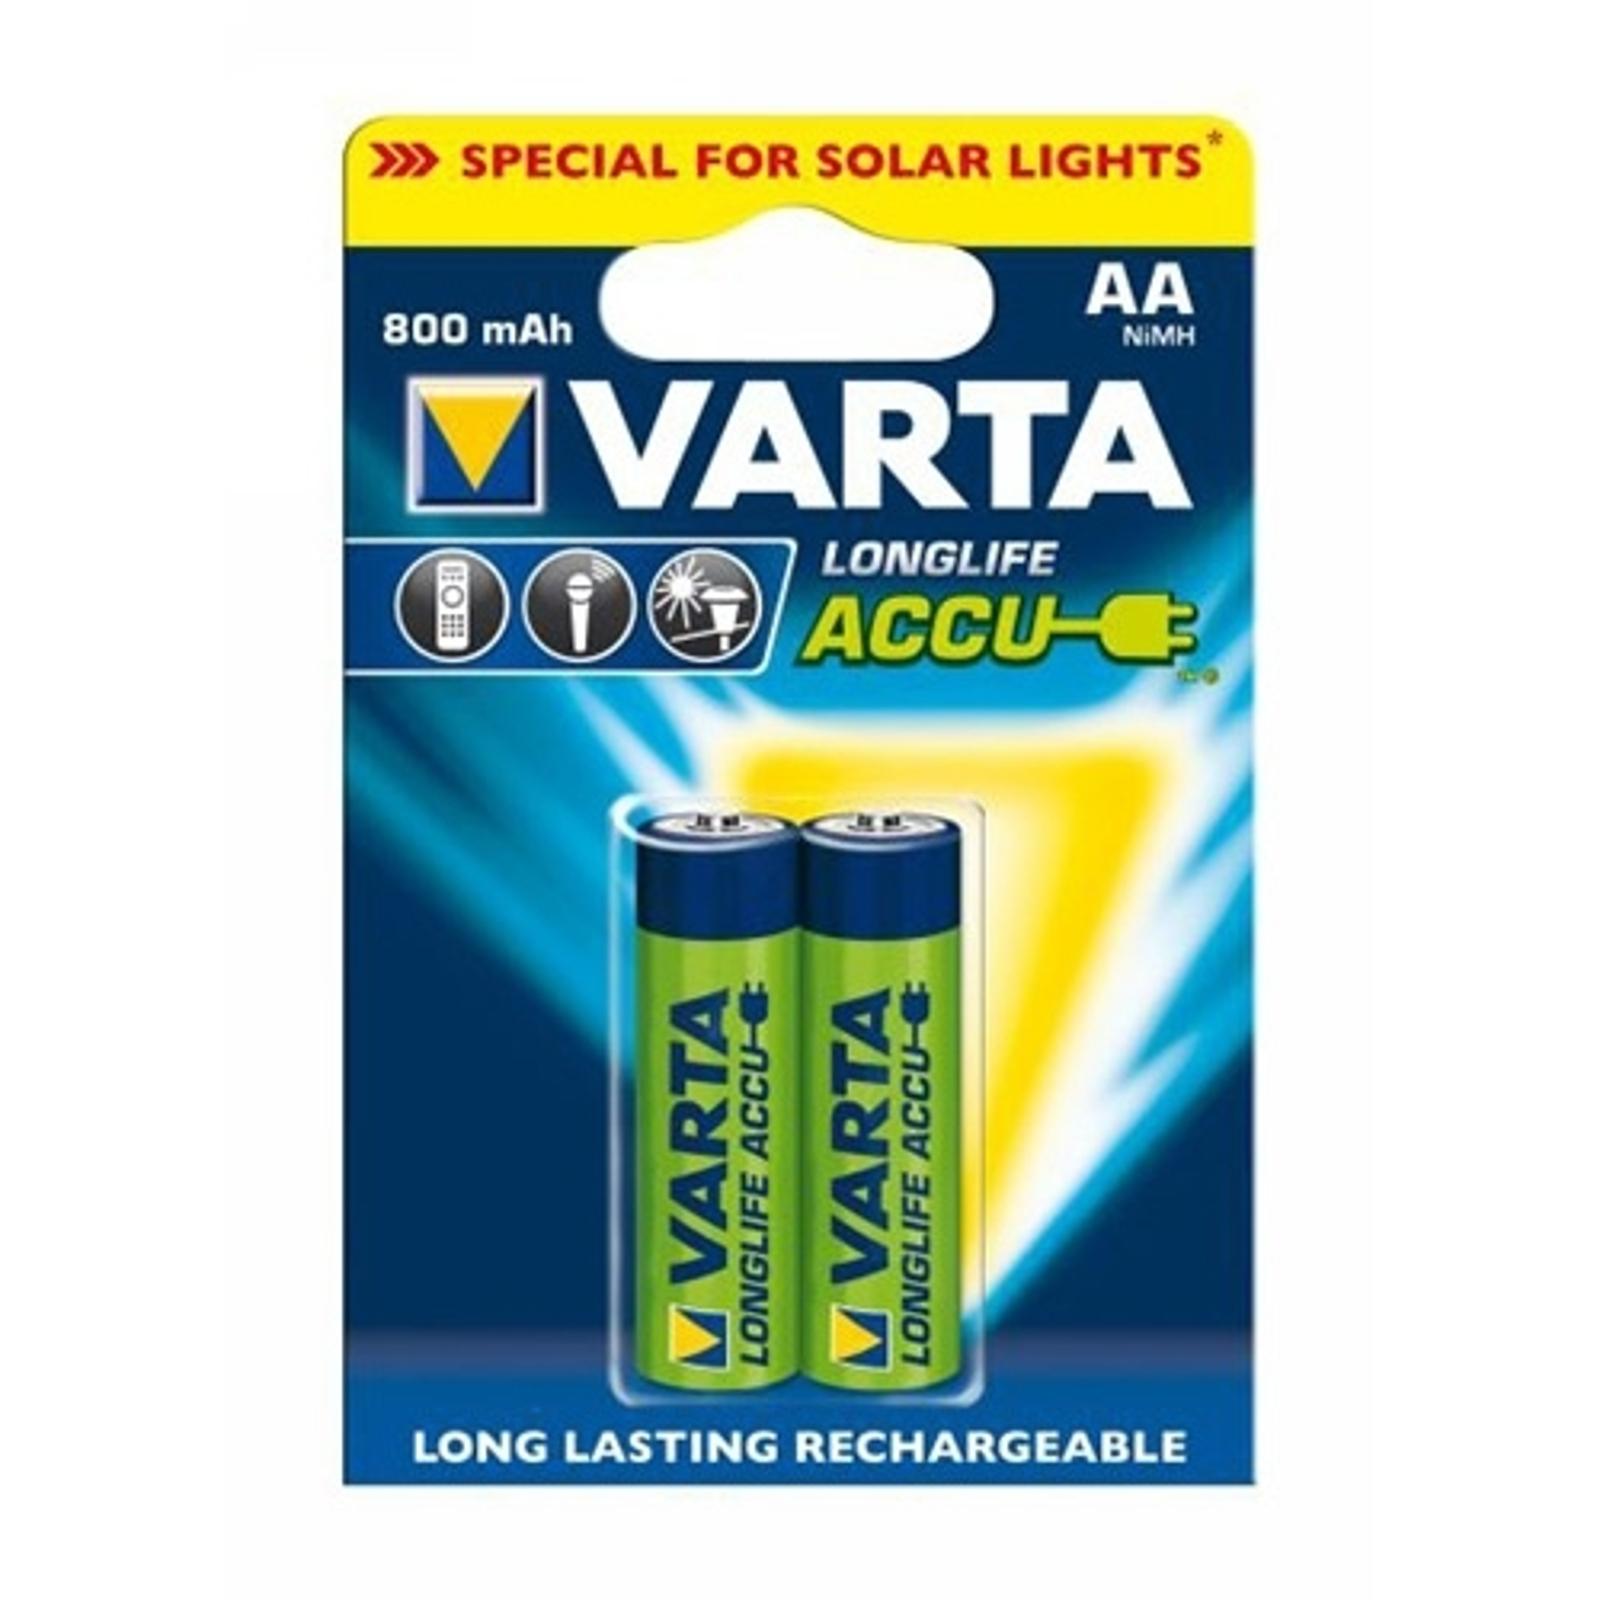 Batteries Varta AA Mignon 56736 1,2V 800 m/Ah